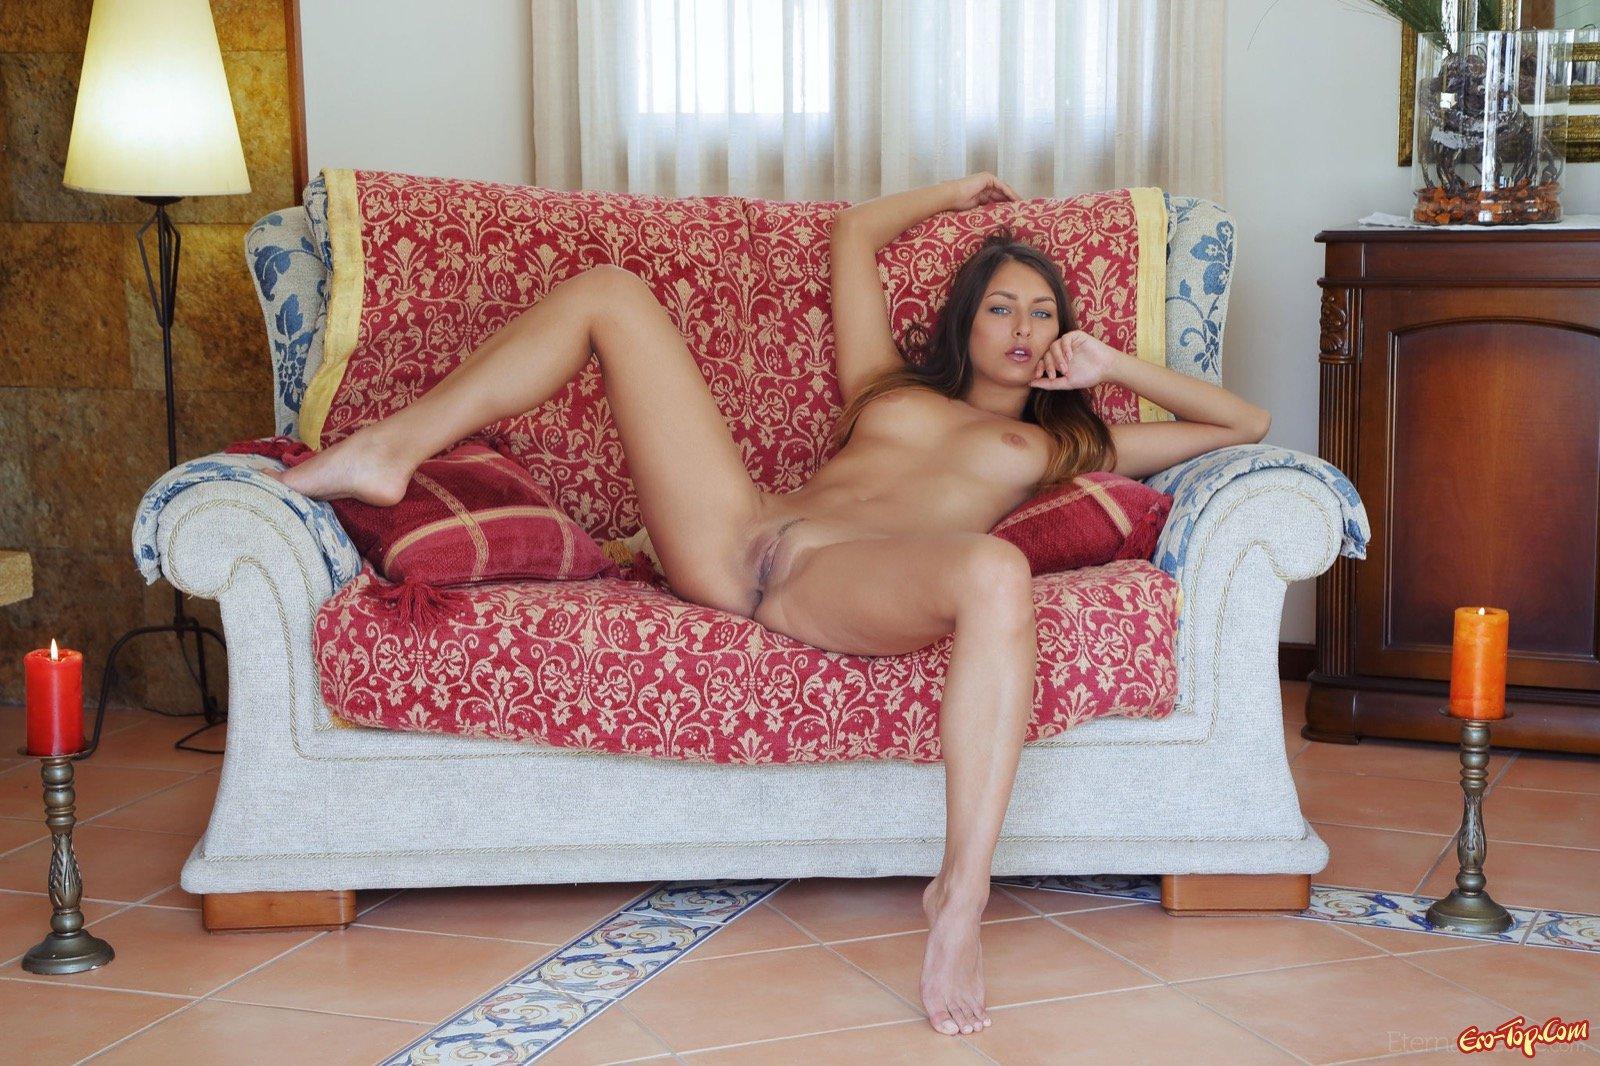 Красотка сняла платье и раздвигает ножки на диване